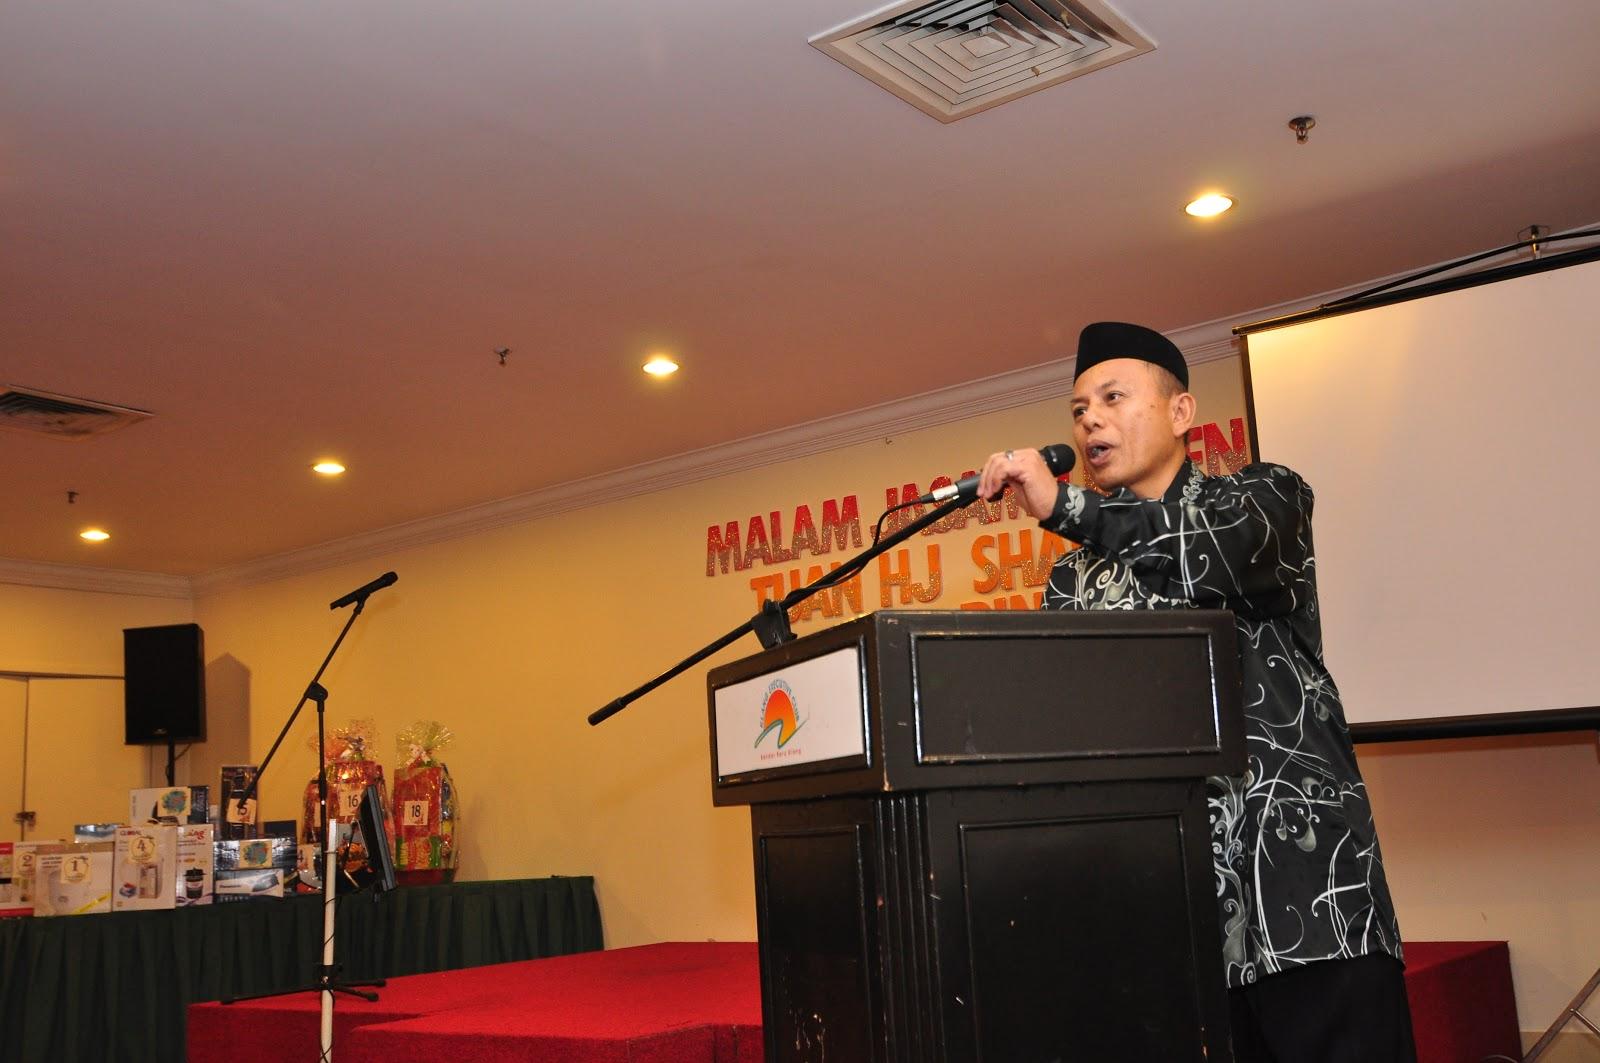 Ketua Ppp Photo: PPP SELANGOR: MAJLIS JASAMU DIKENANG KETUA PPP NEGERI SELANGOR